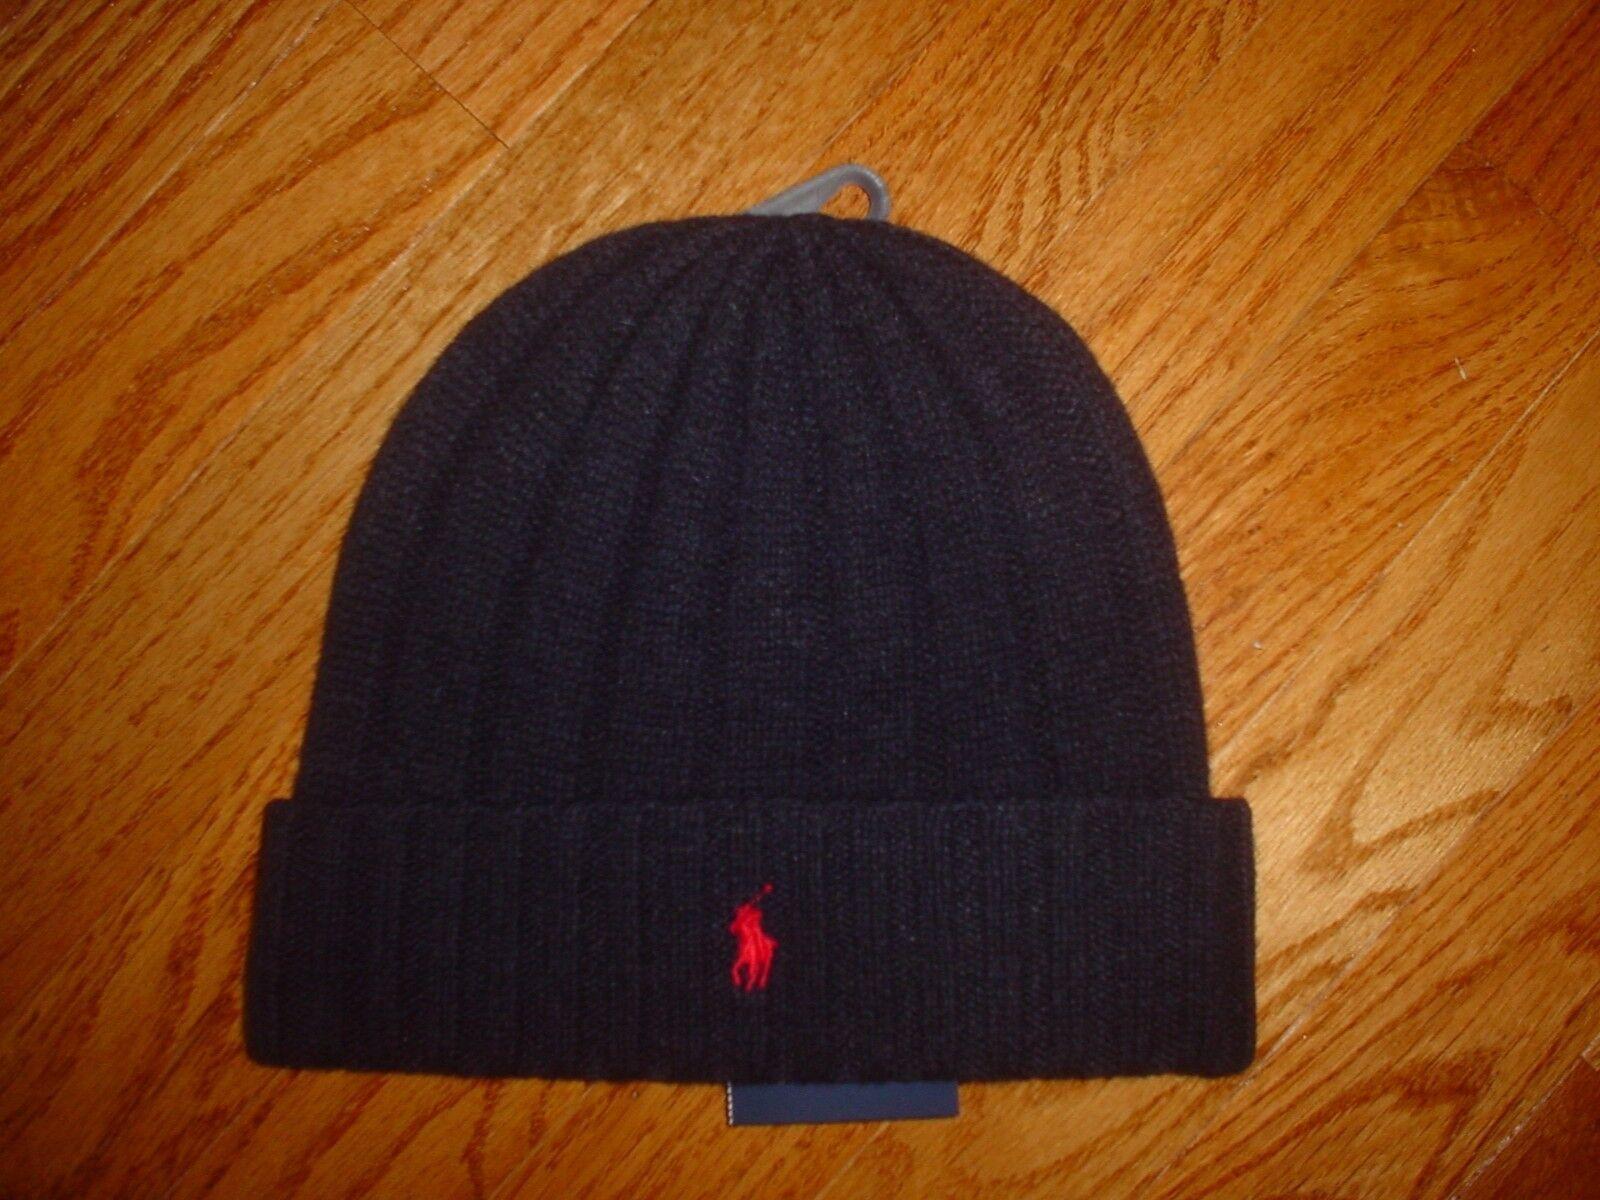 Polo Ralph Lauren Mens Skull Beanie Winter Cap Ski Hat Wool Blend New NWT